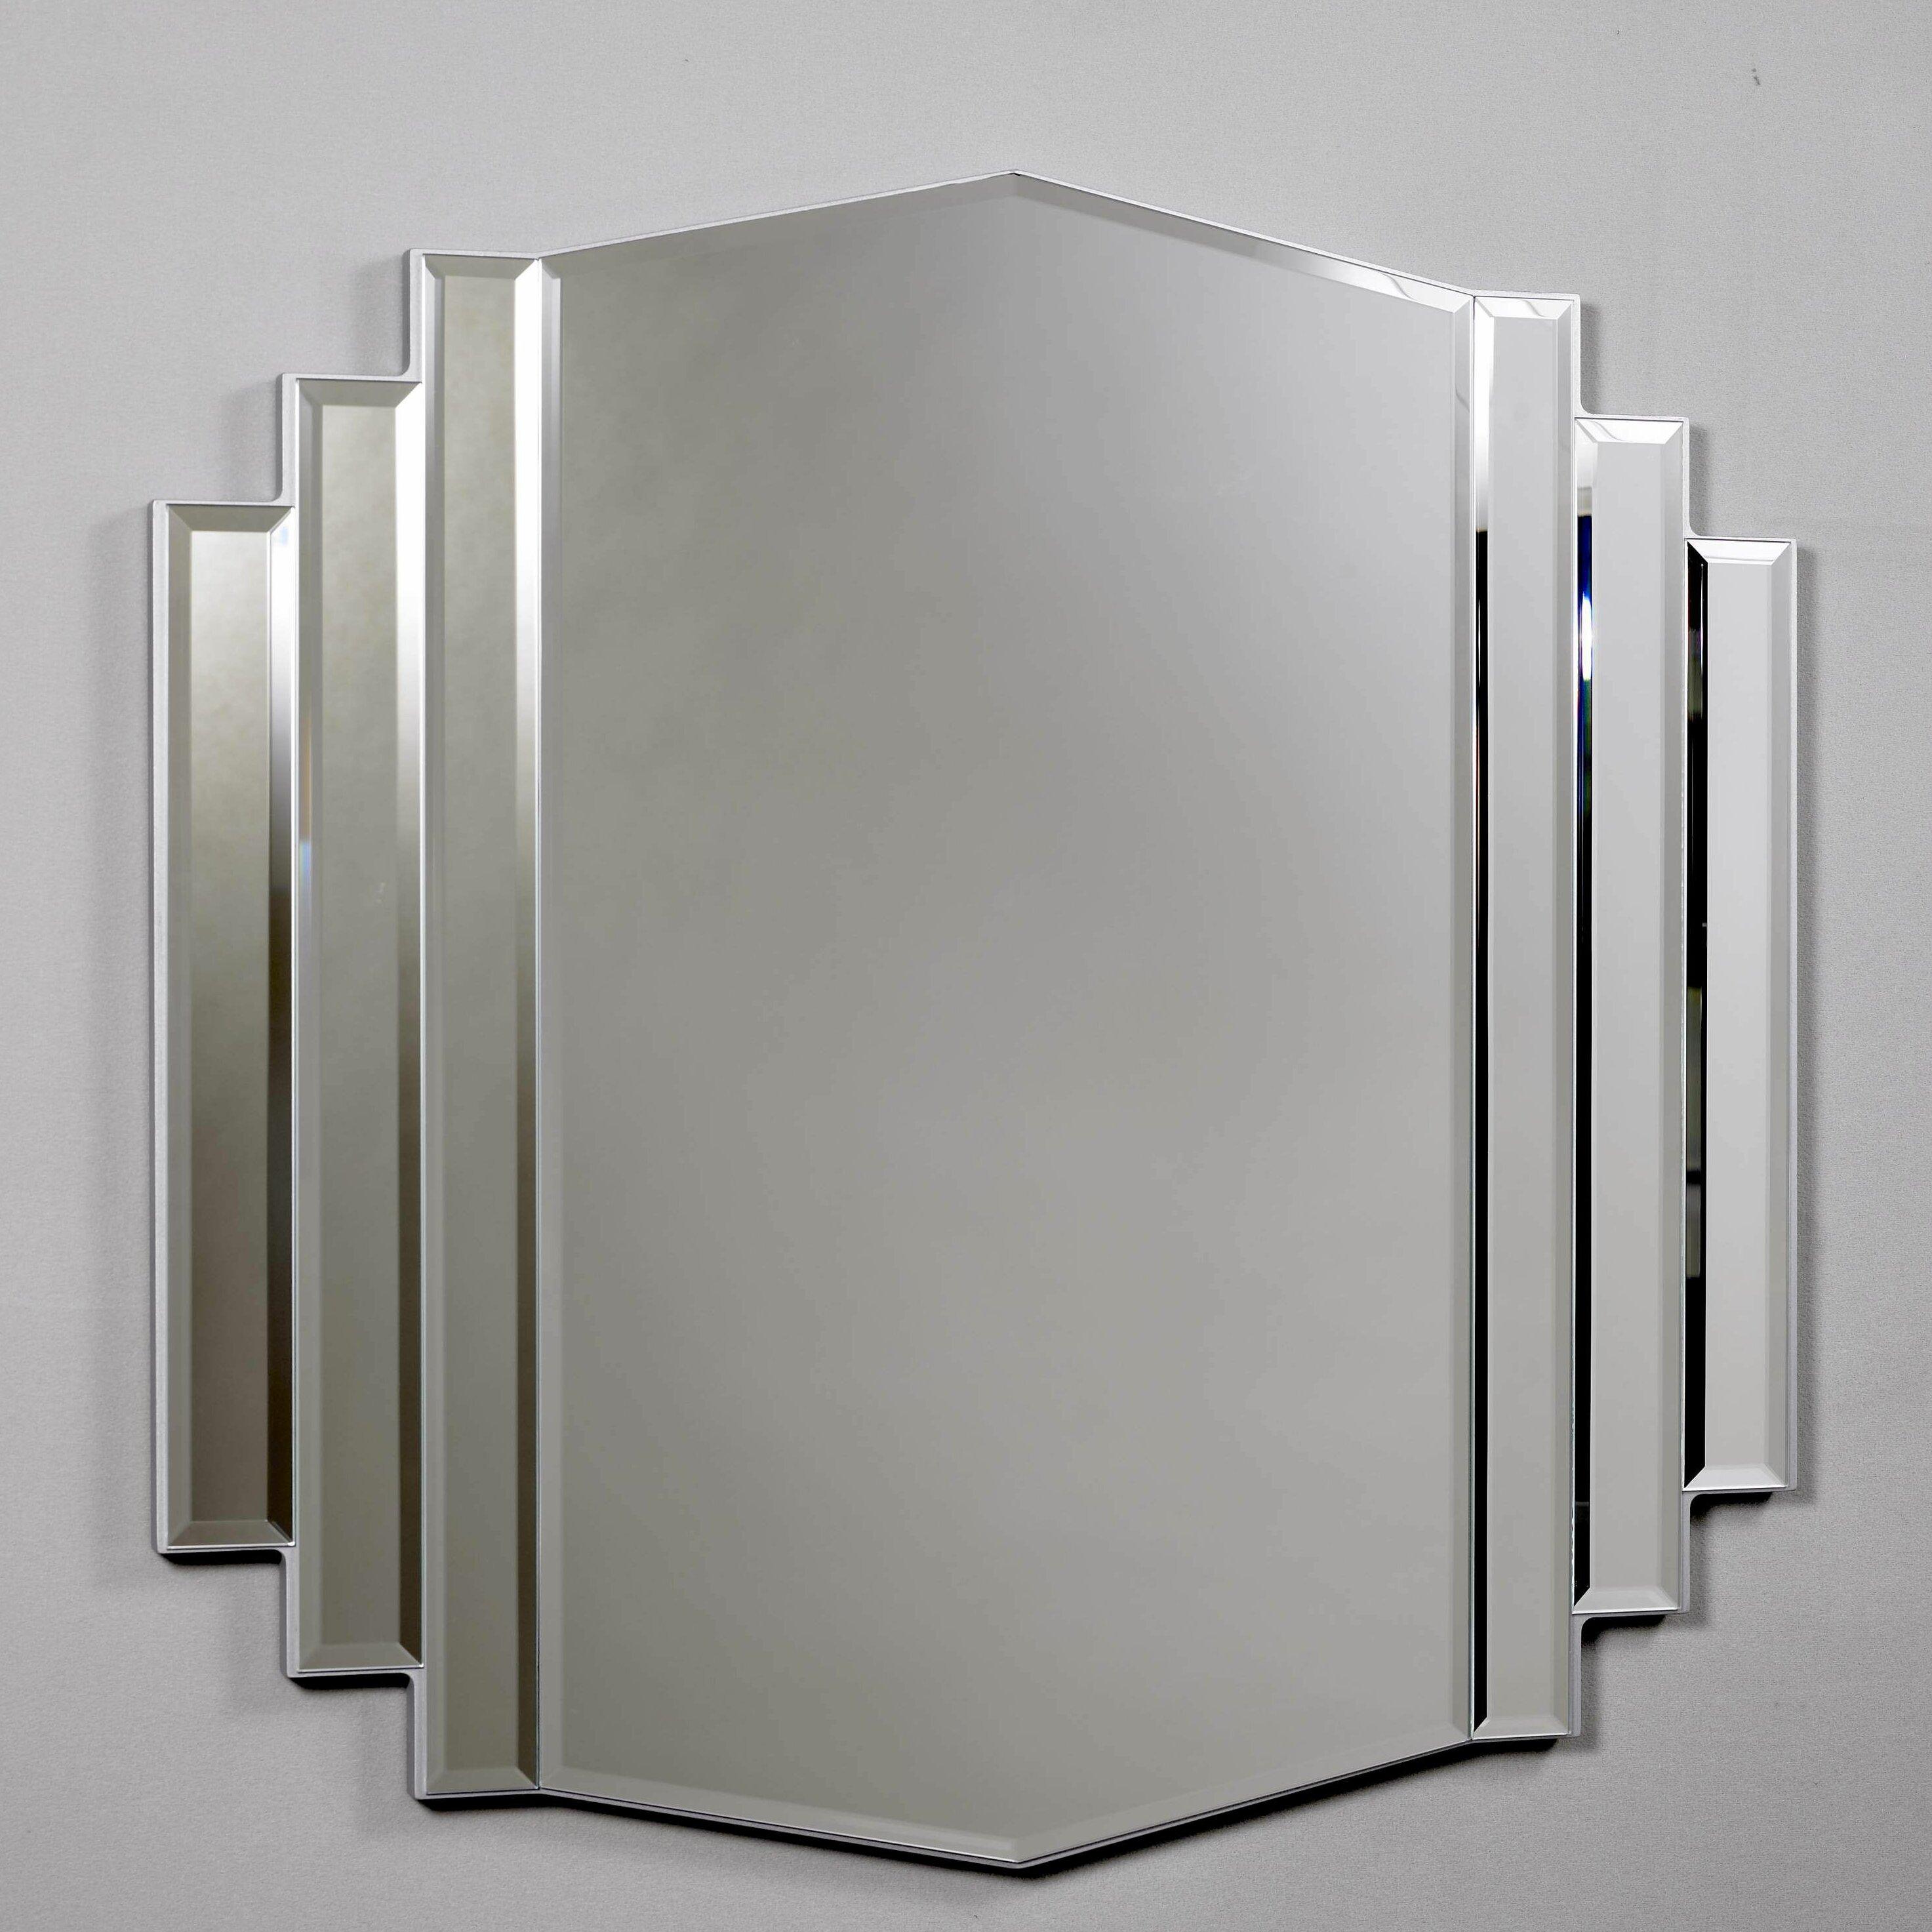 Bathroom Art Deco Mirrors: Morris Mirrors Ltd Art Deco Design Mirror & Reviews